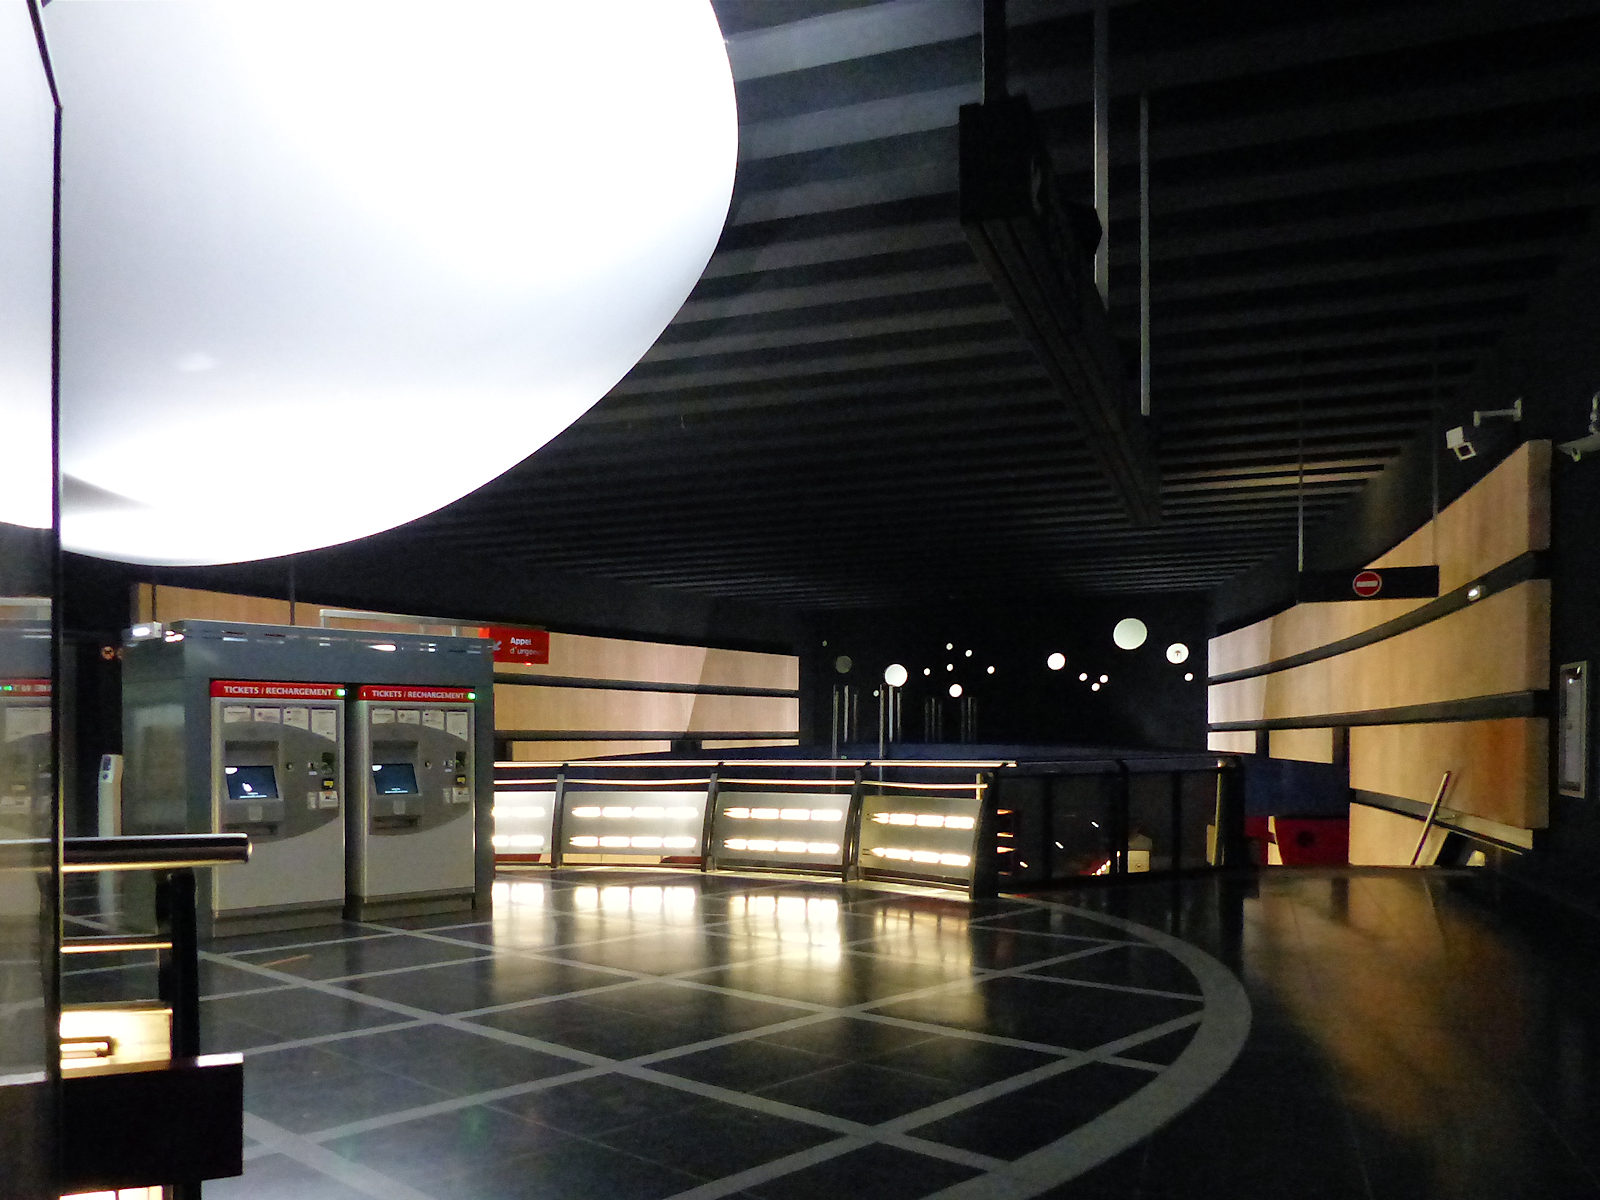 Métro Tourcoing - Ligne 2, Station Mercure